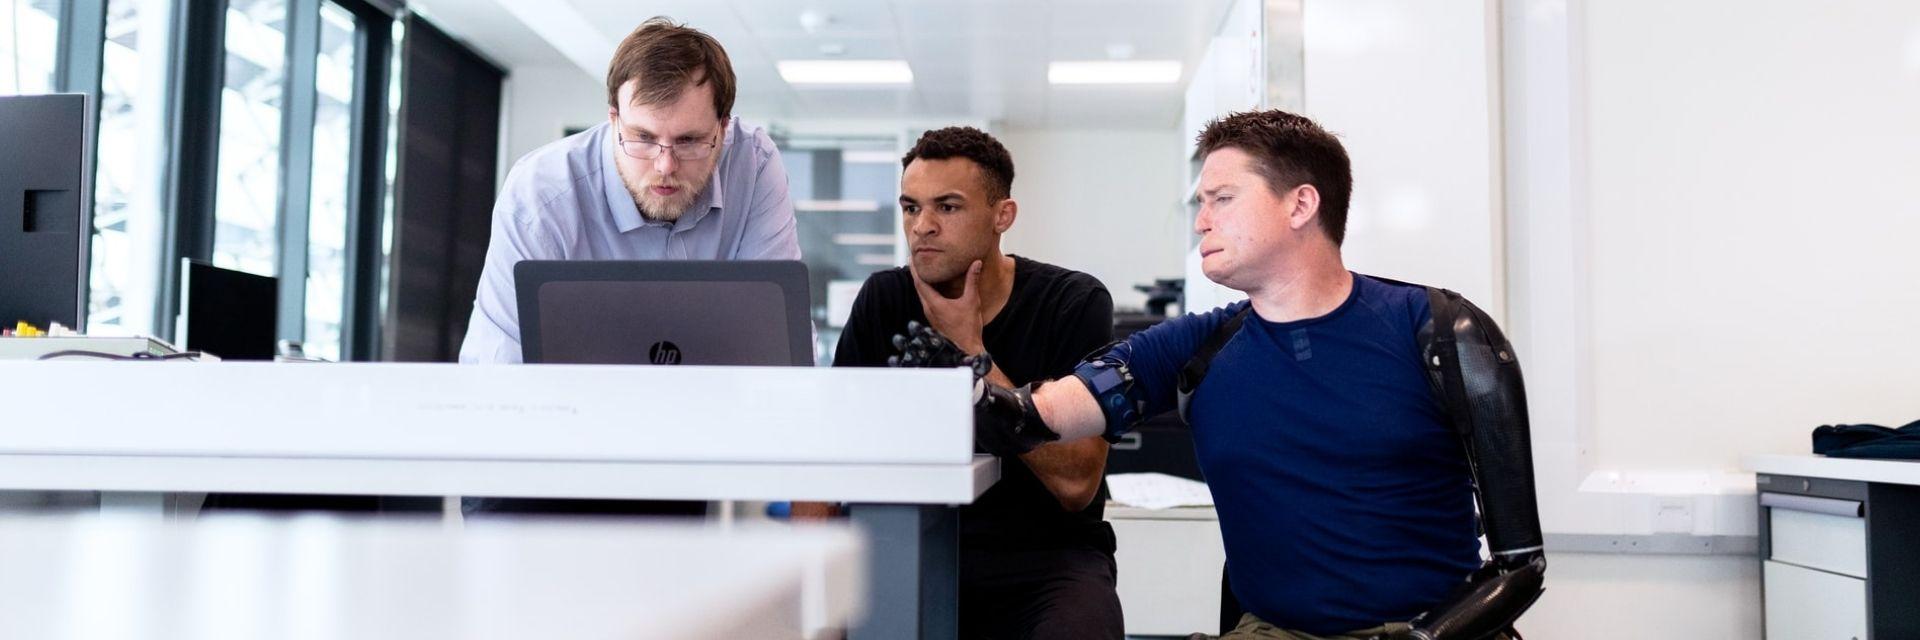 Company retains diverse employee through inclusion programs